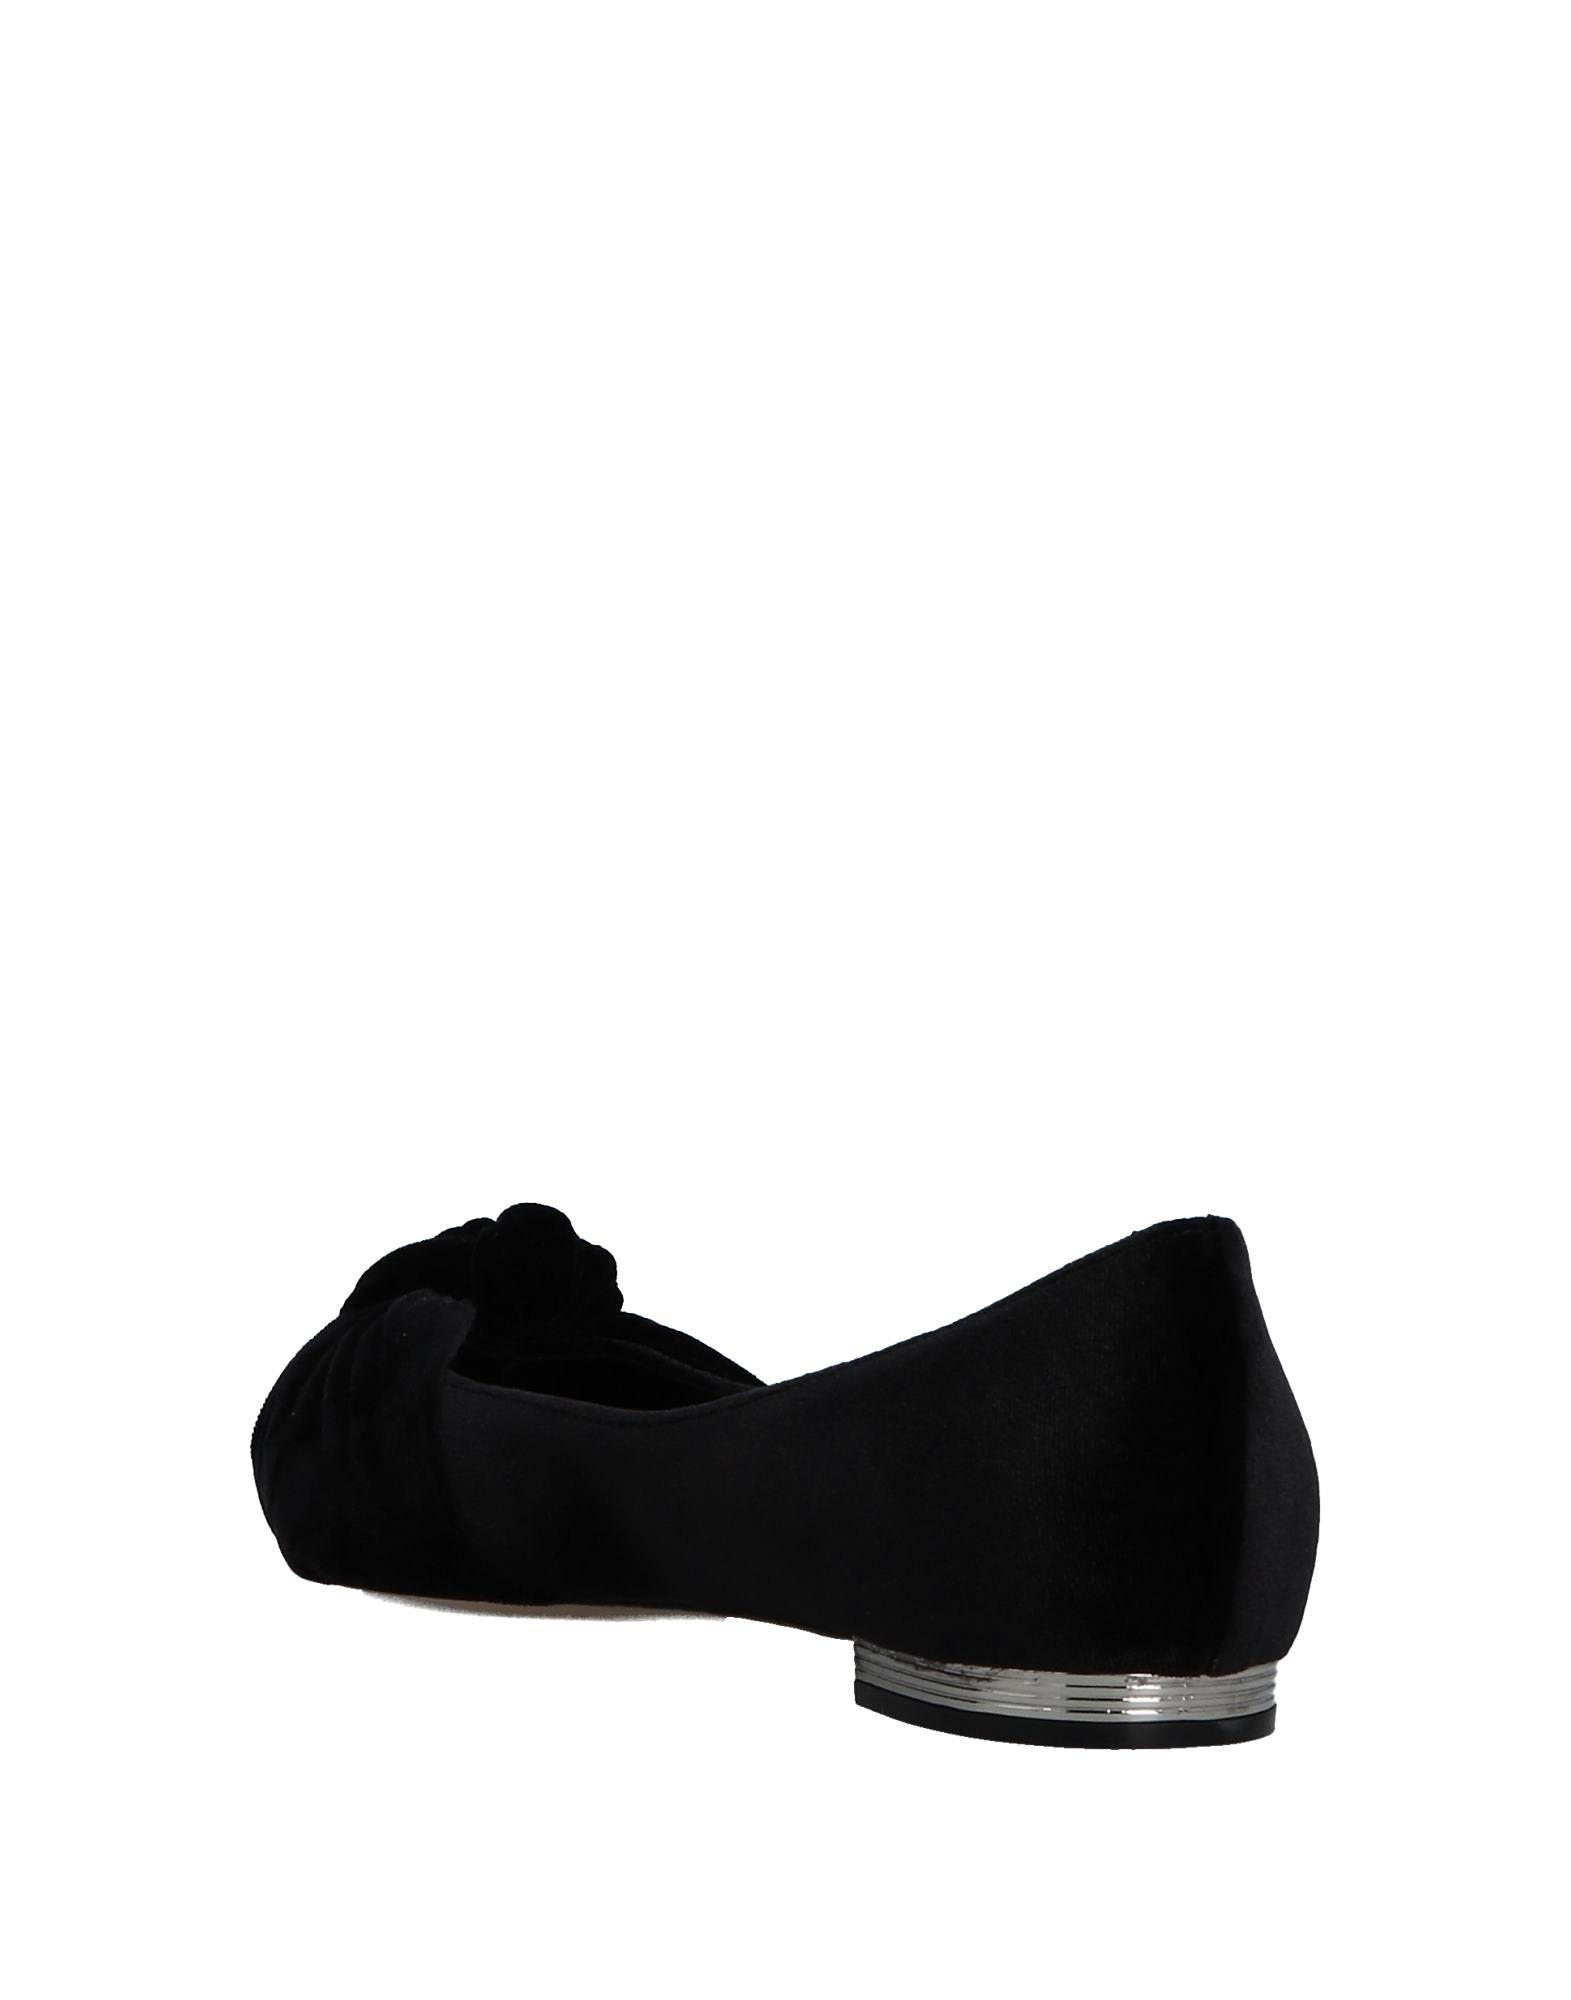 Flats Lyst Silla Black Le In Ballet qqawPgt